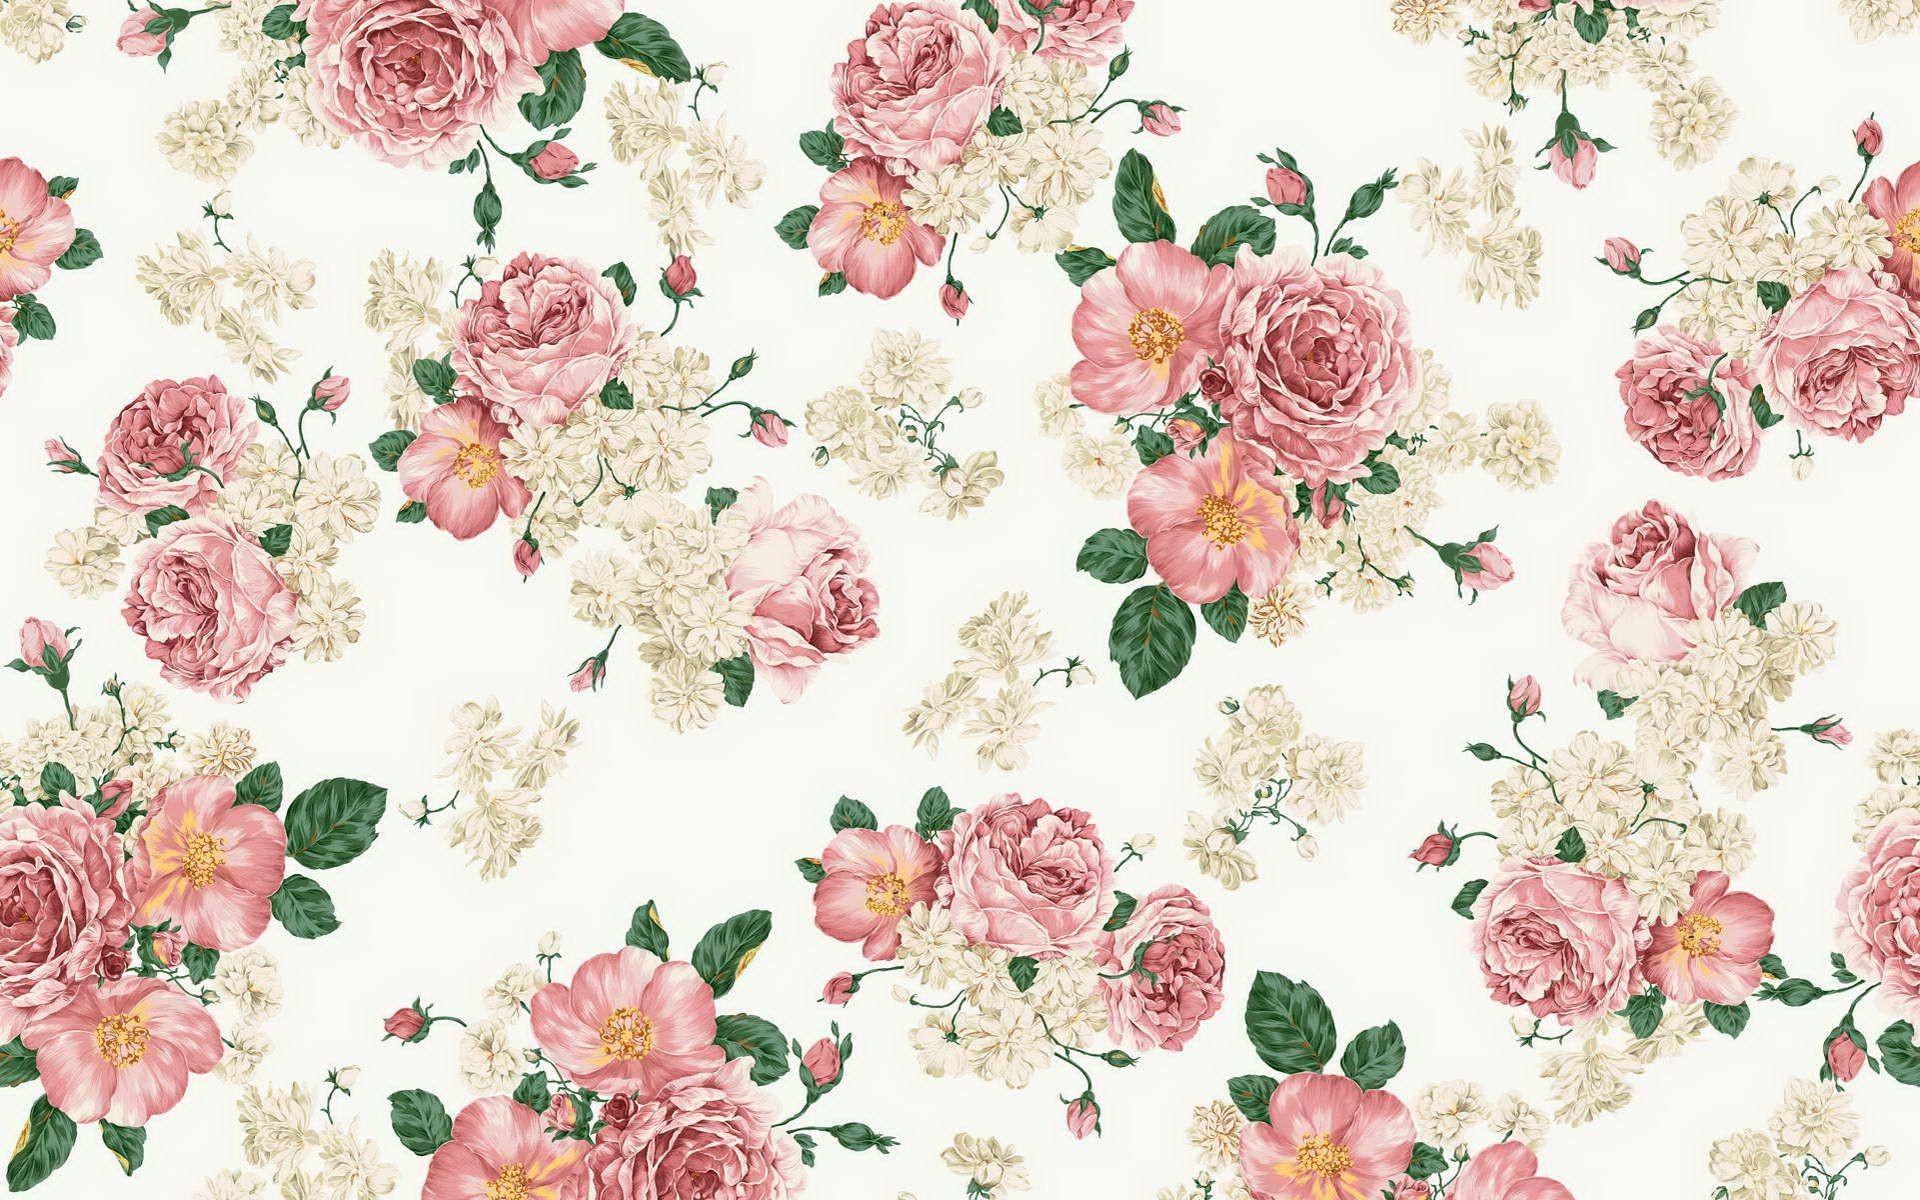 Floral Background Pattern Hd Wallpaper